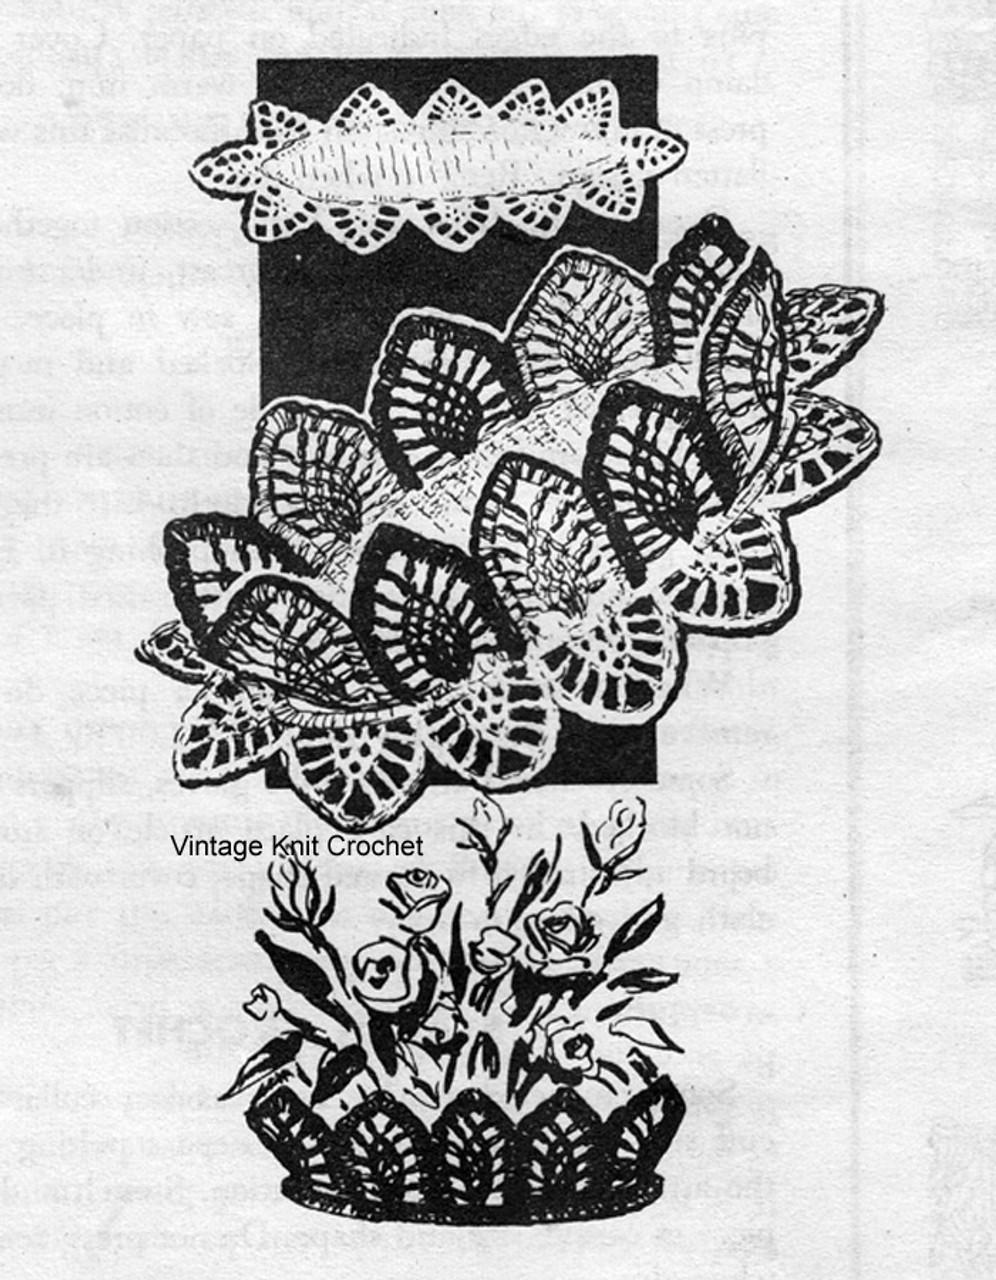 Doily Bowl Crochet pattern in Pineapple Stitch, Alice Brooks 7308